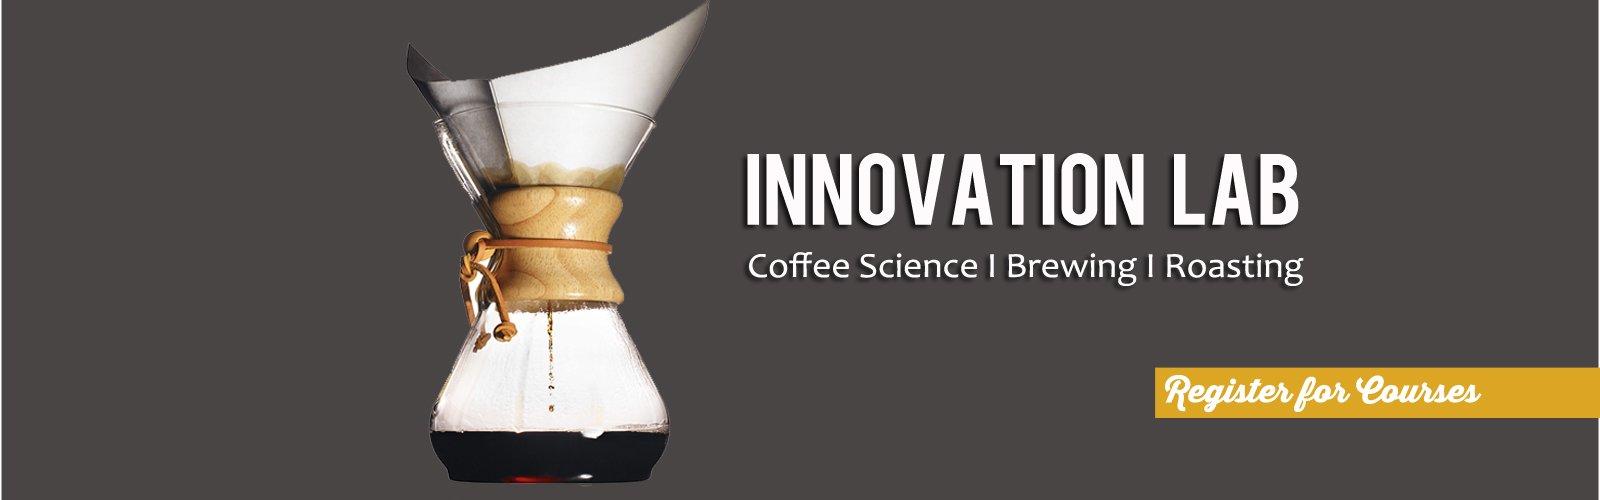 Innovation Lab_Chemex